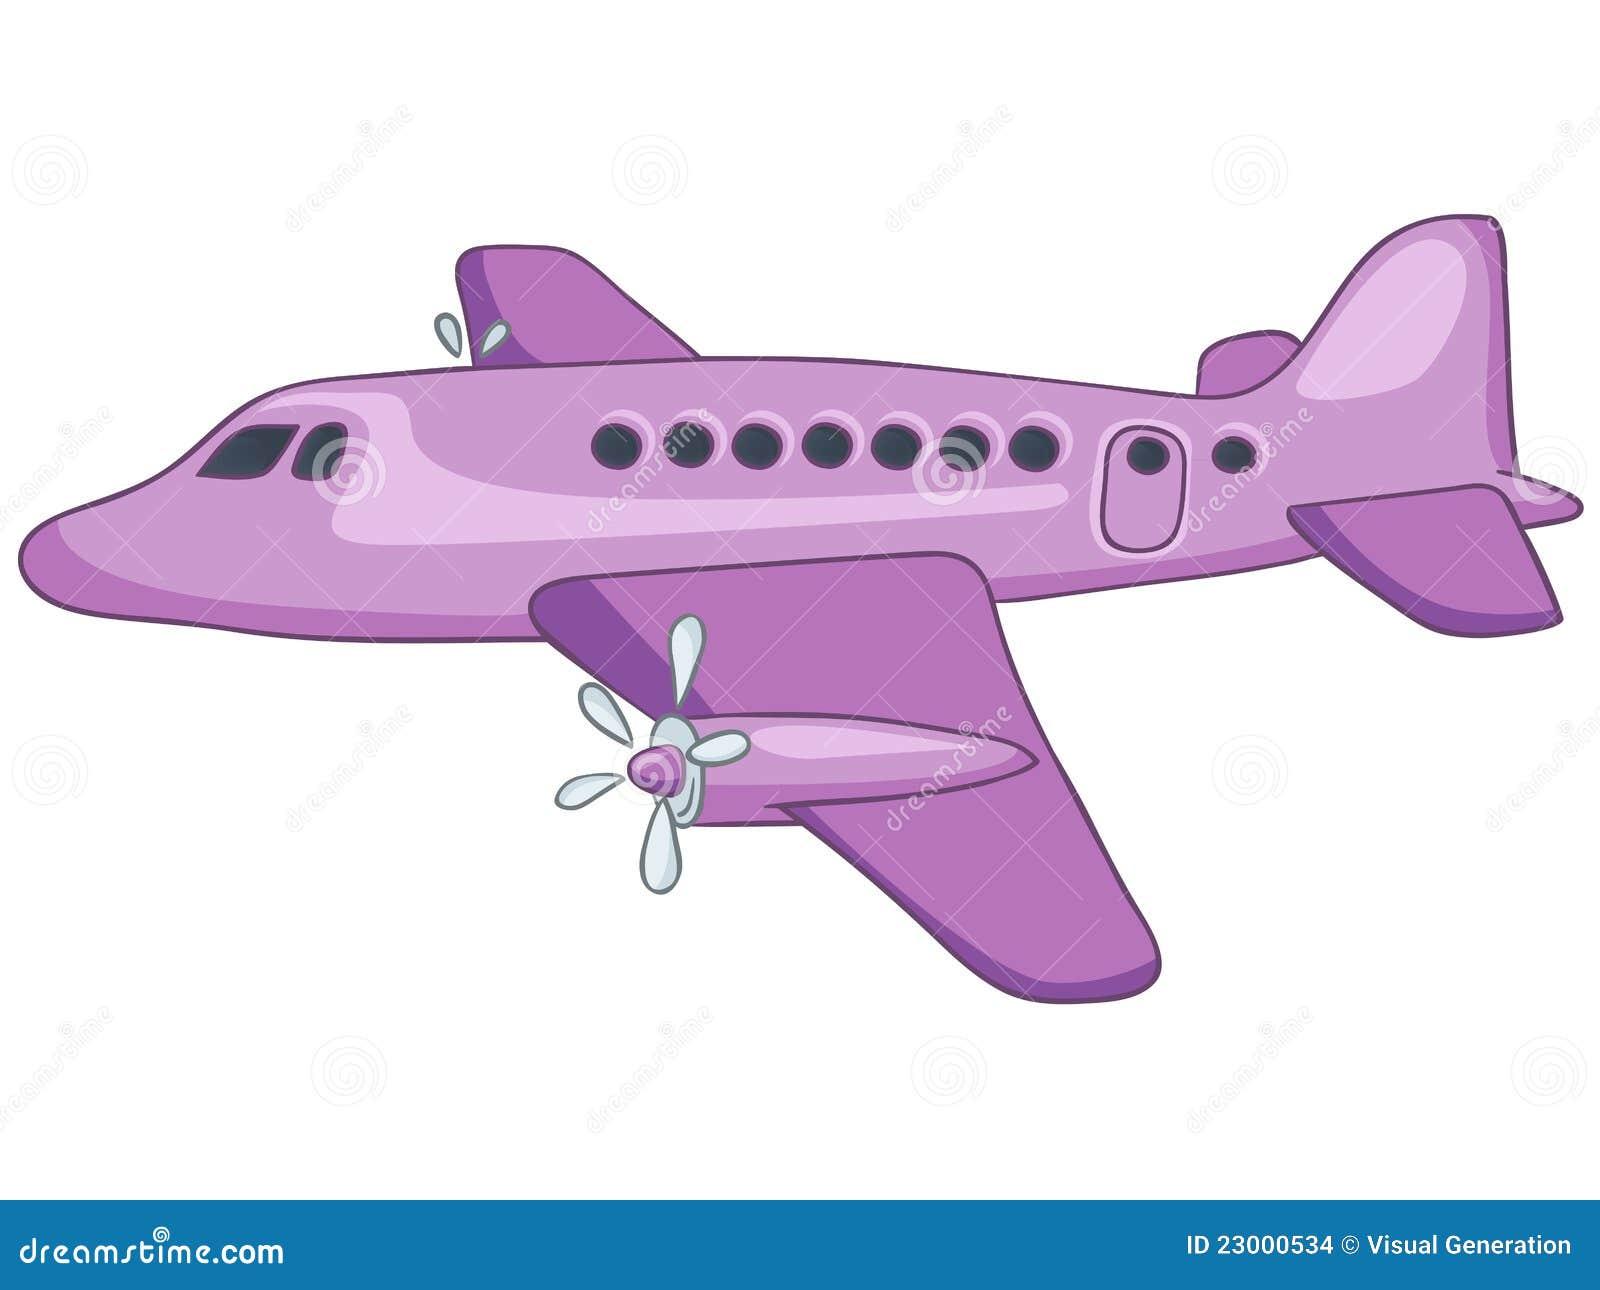 Karikatur Flugzeug